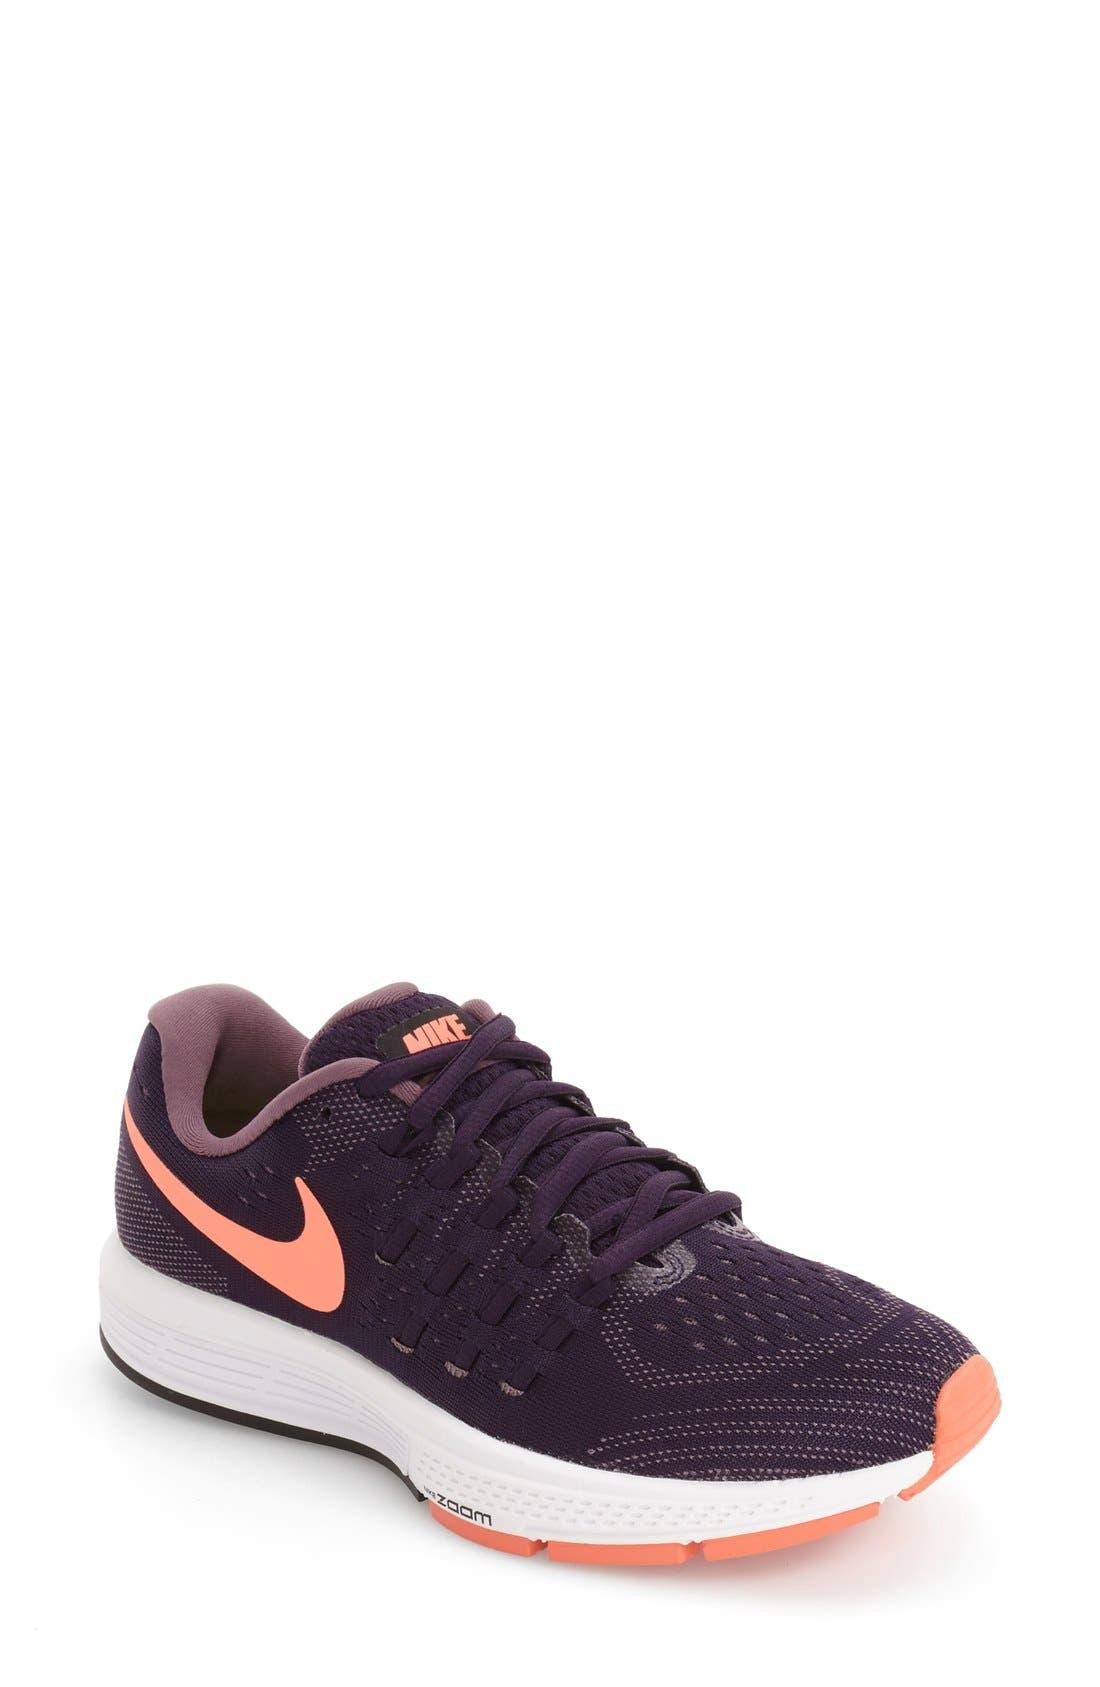 Alternate Image 1 Selected - Nike Air Zoom Vomero 11 Sneaker (Women)